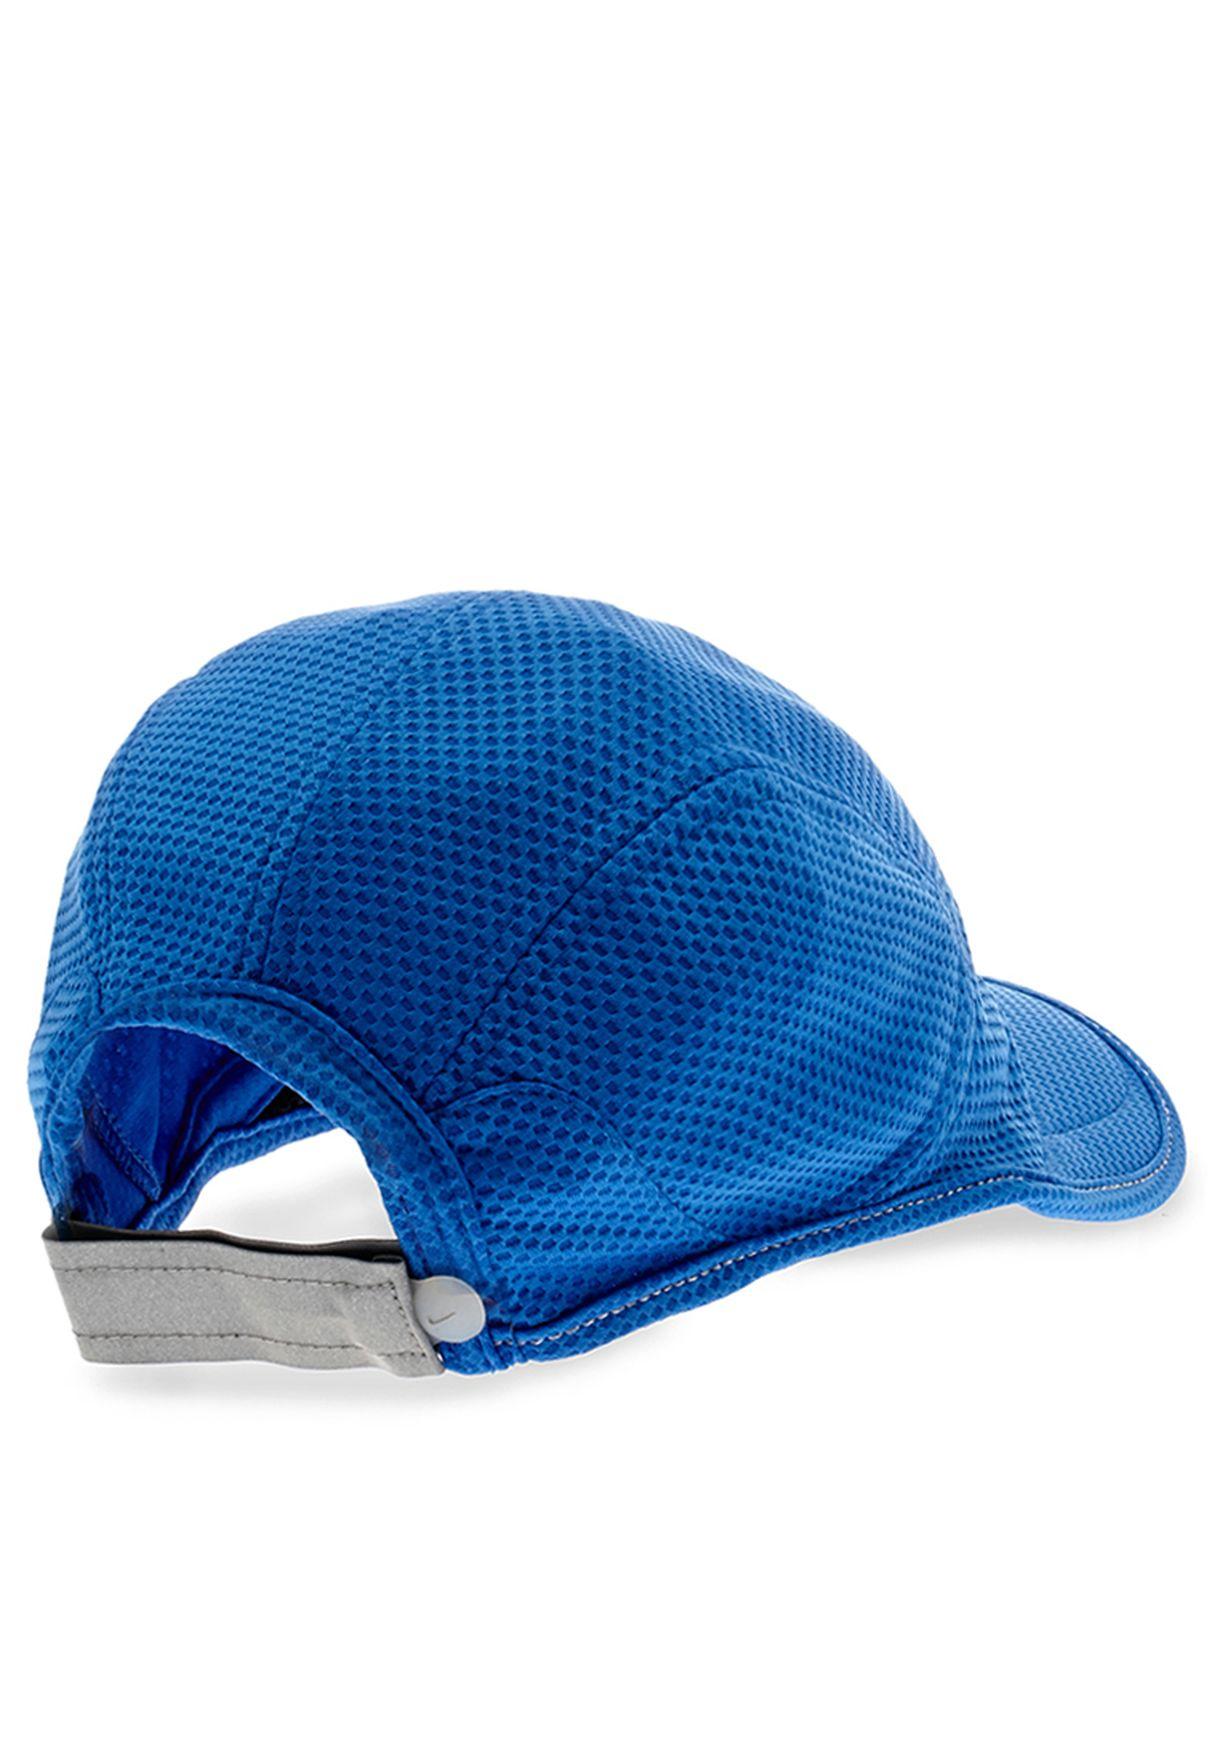 05d3d065957d8 Shop Nike blue Mesh Daybreak Cap NKAP520787-440 for Men in UAE ...